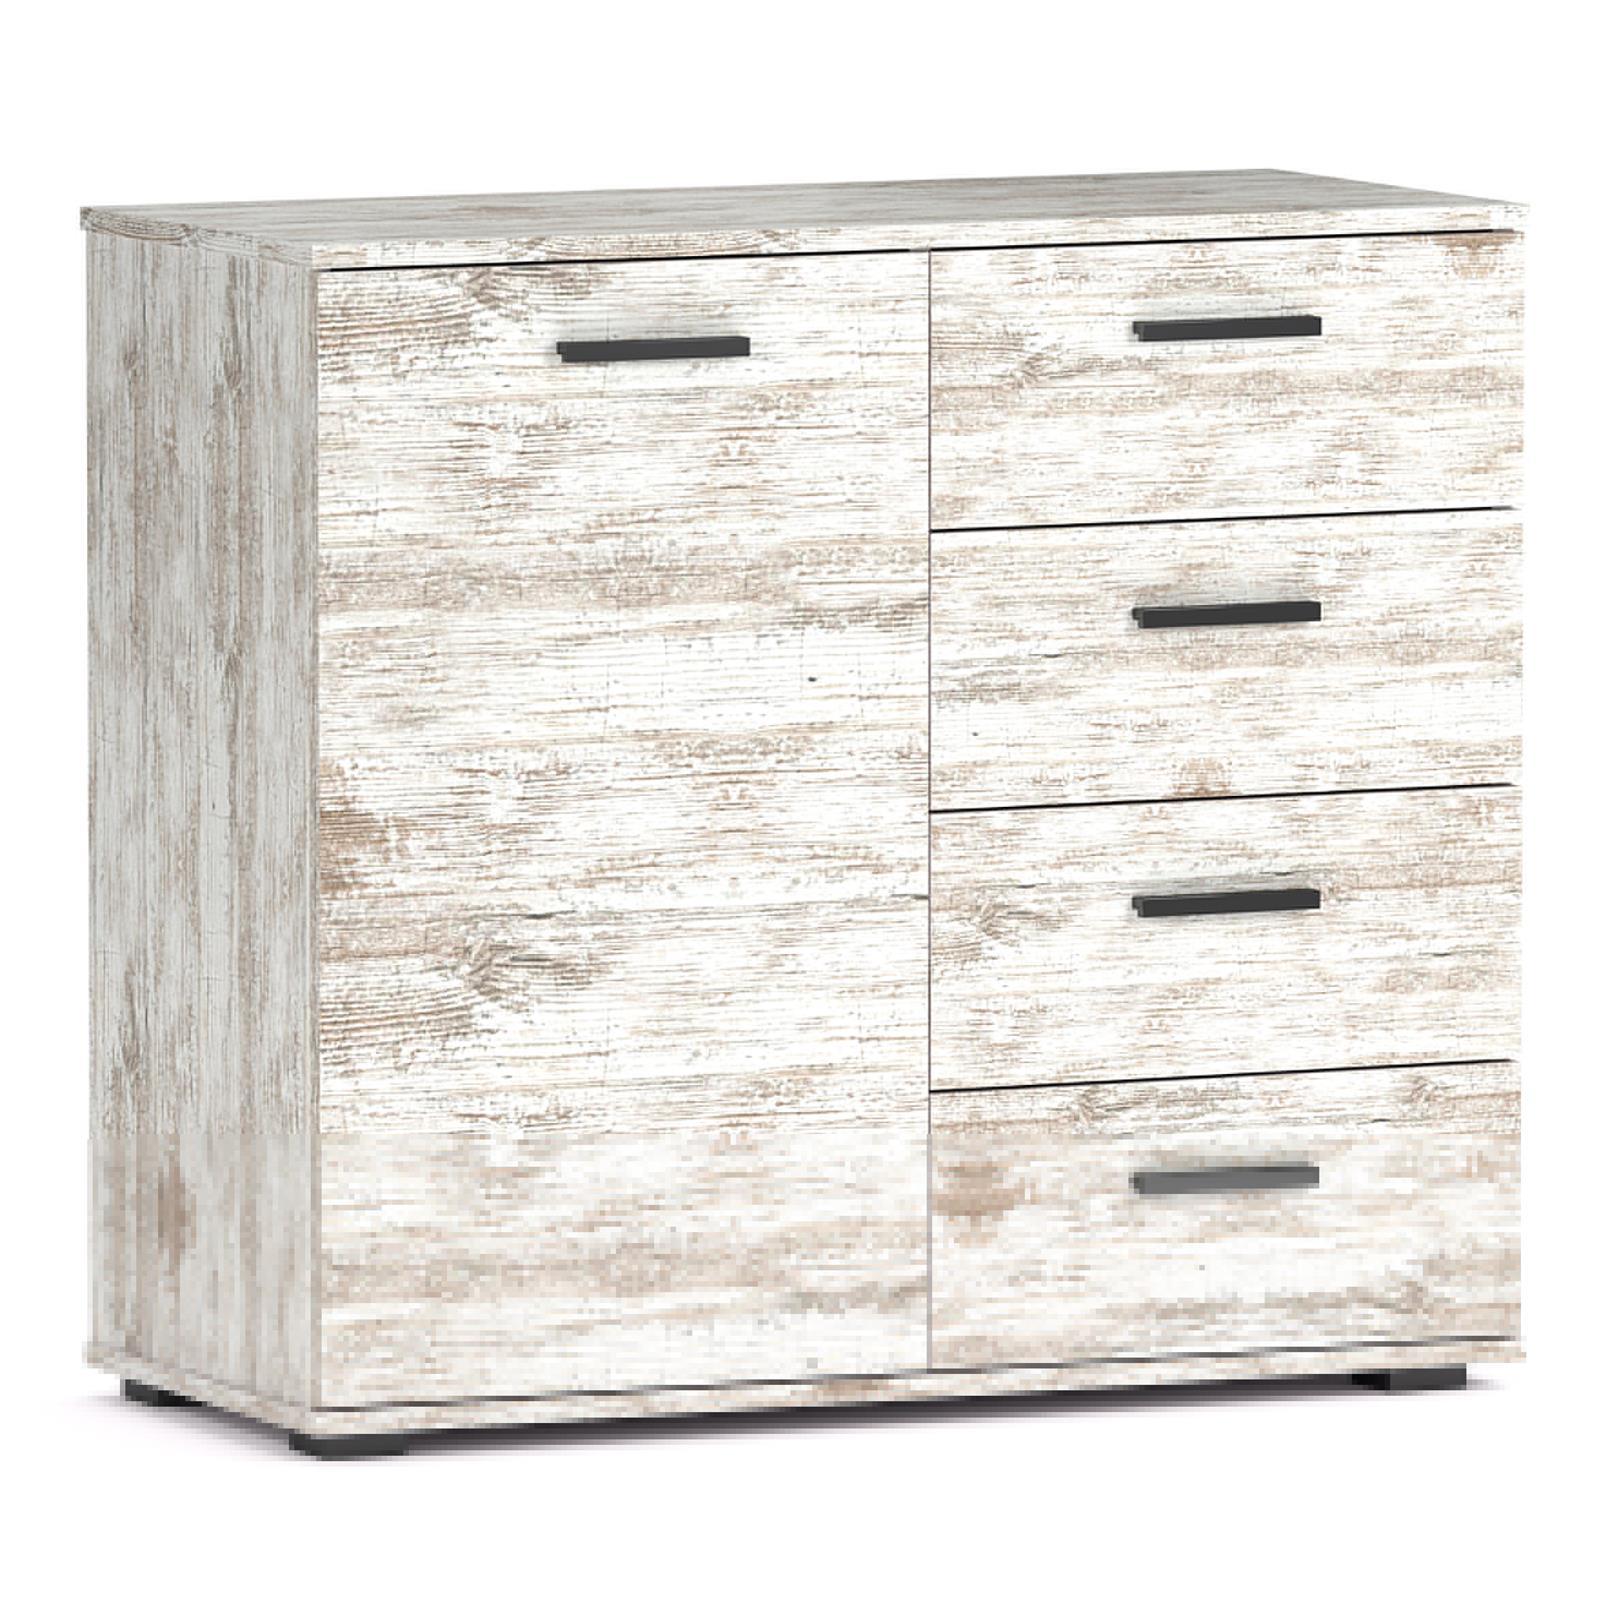 kommode chicago shabby chic 4 schubladen caro m bel. Black Bedroom Furniture Sets. Home Design Ideas